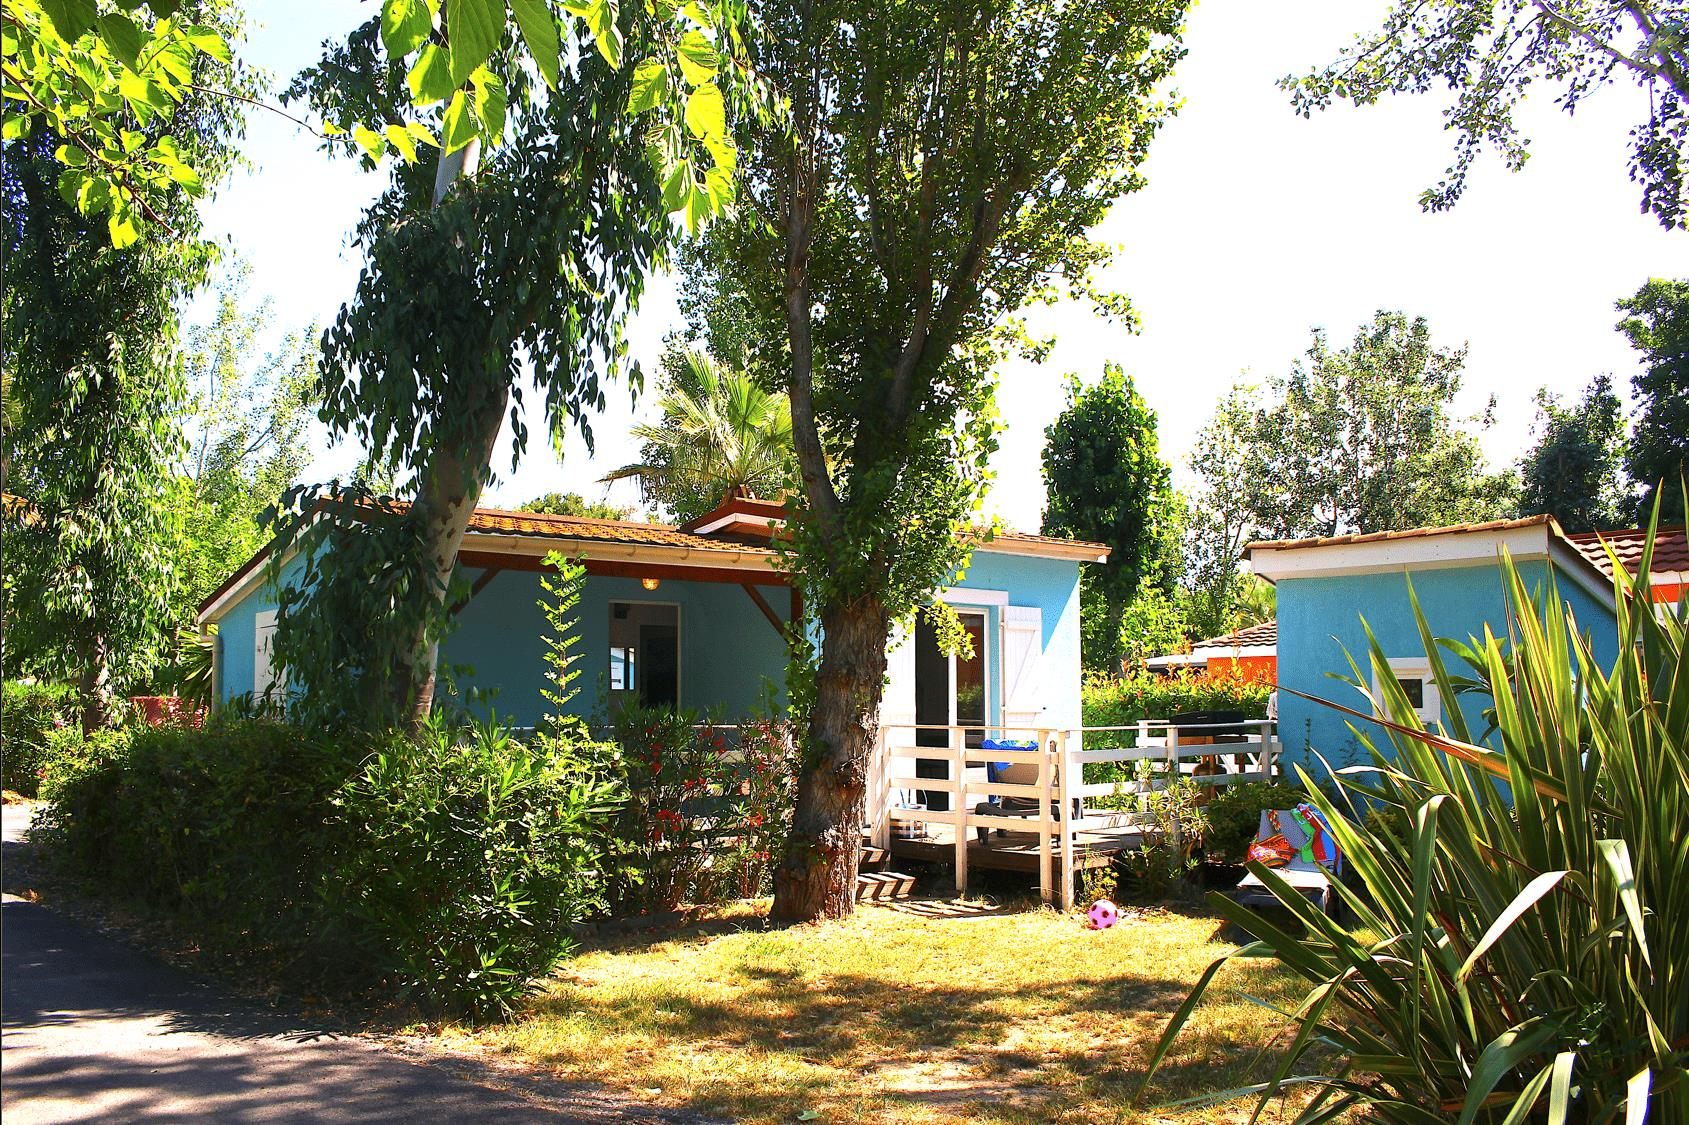 Location - Maya, Confort - Dimanche - 2 Chambres - Camping L'Air Marin